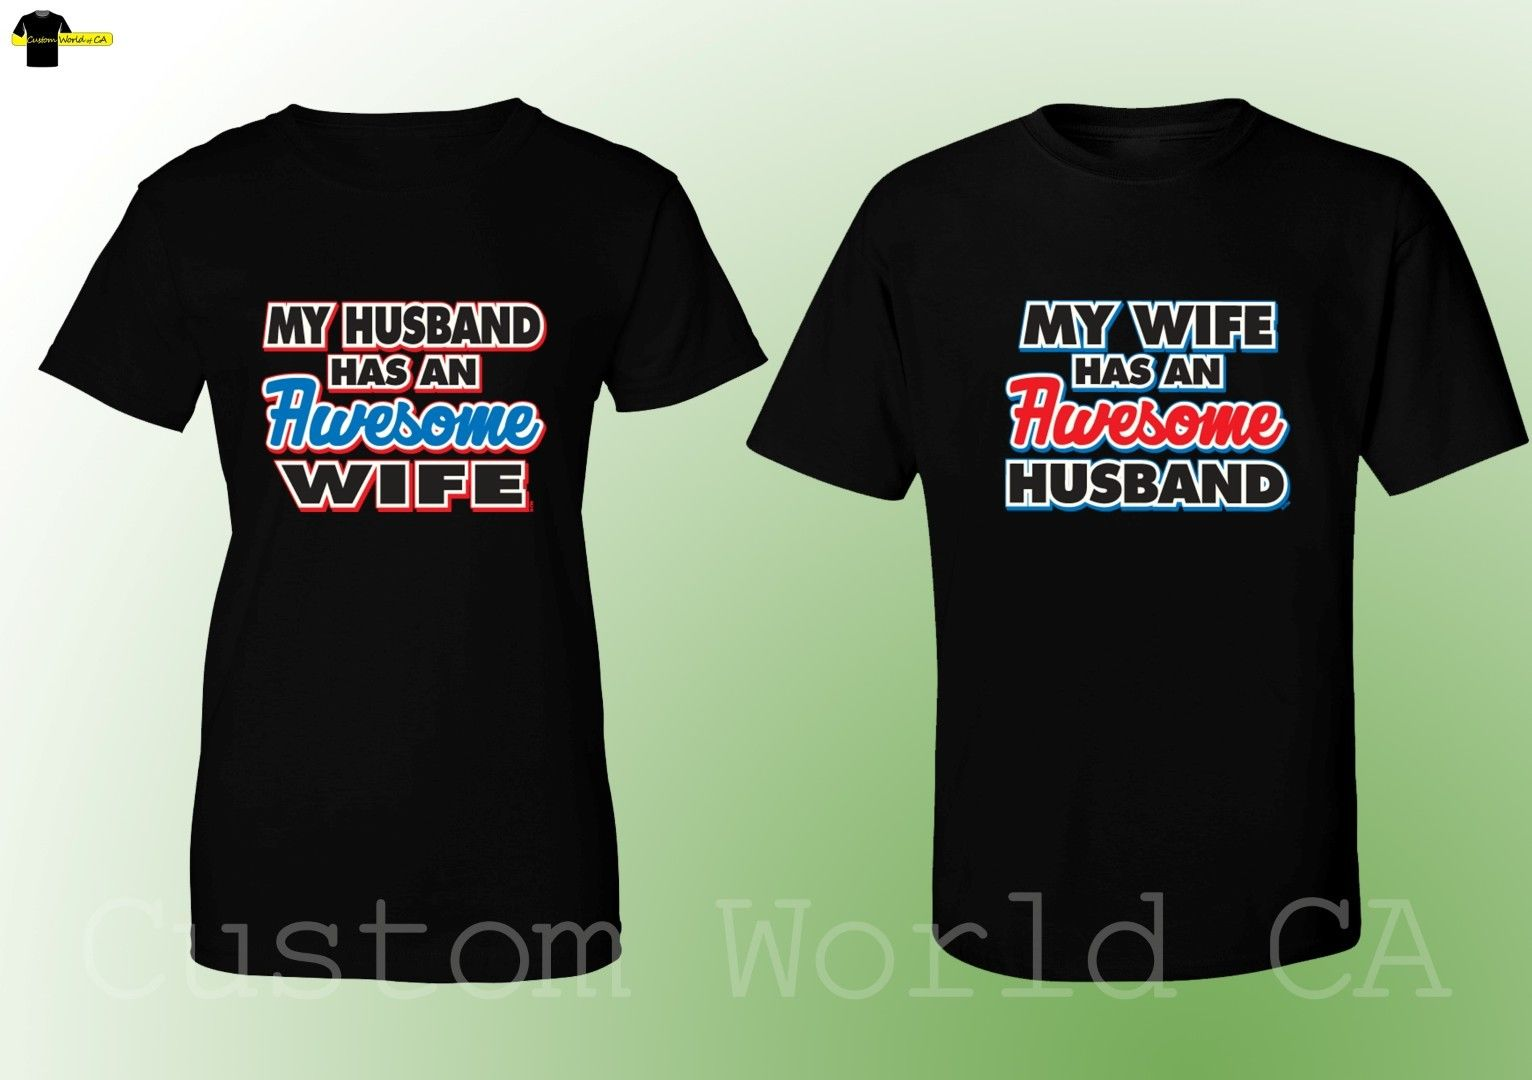 2019 Hot Sale 100% cotton Couple Matching T Shirts My Husband Wife Has An Awesome Wife Husband Tees XT Tee shirt